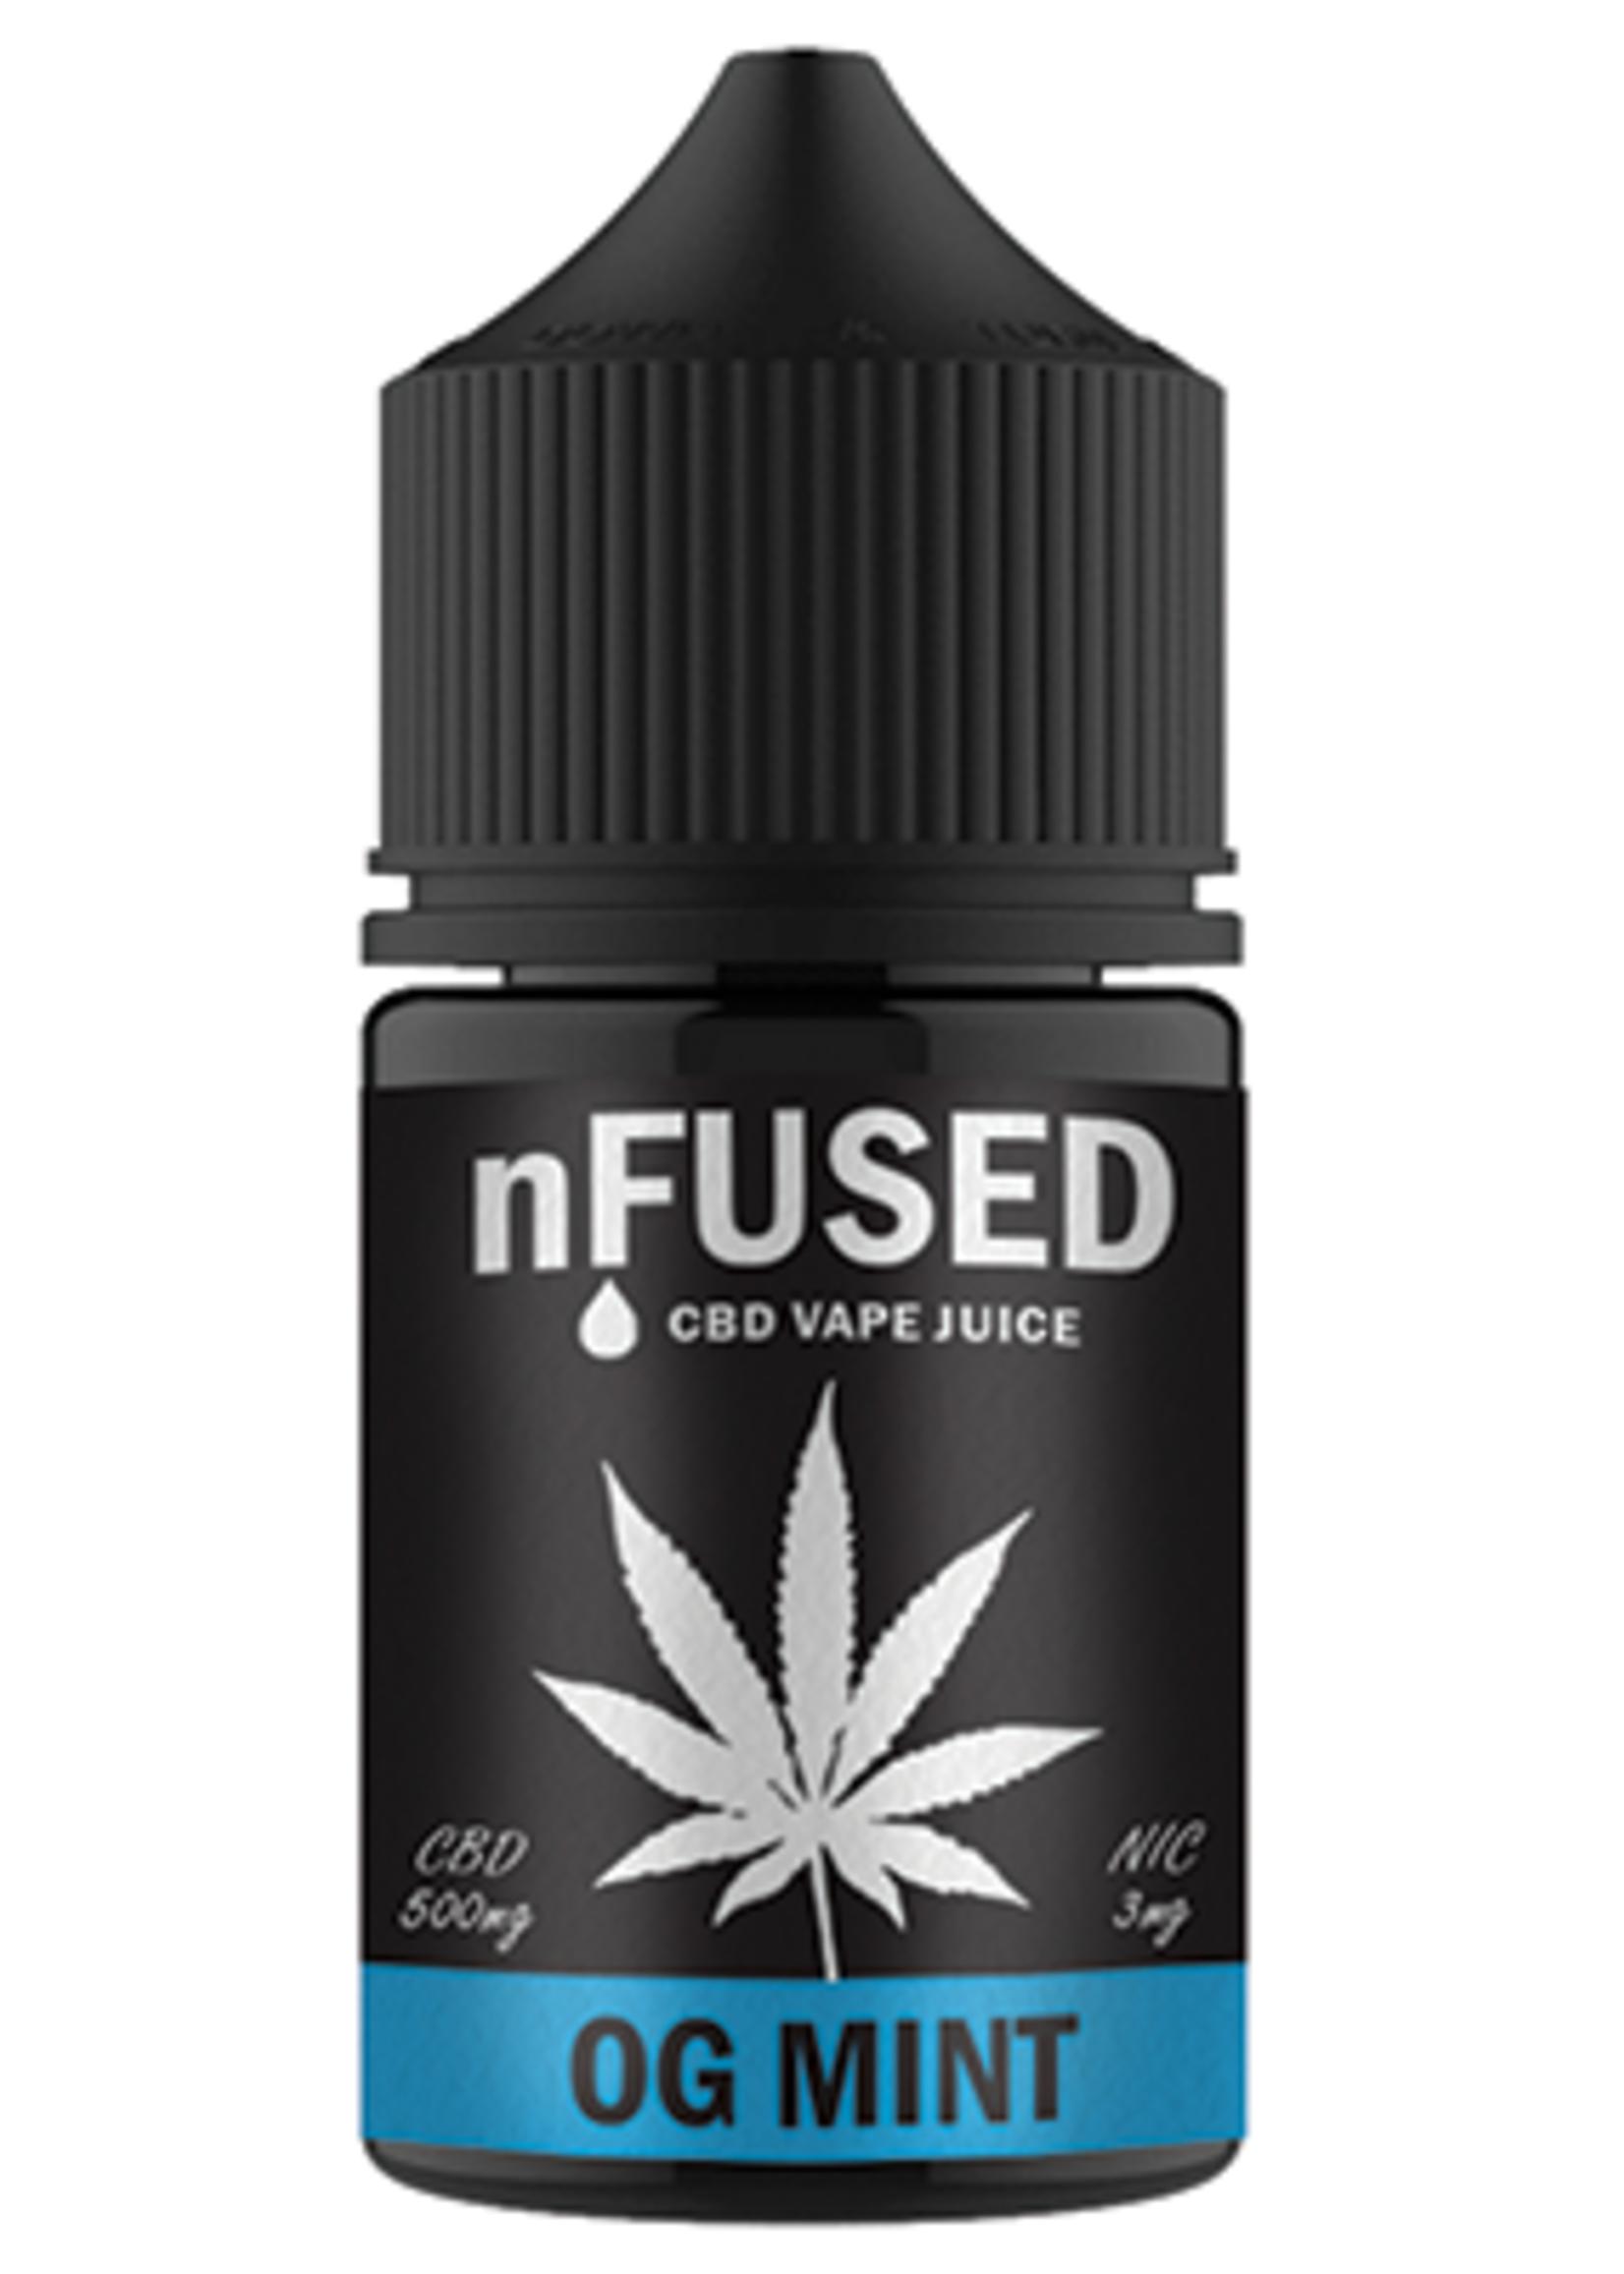 Vape flavour - CBD nfused OG mint 30ml- 3mg